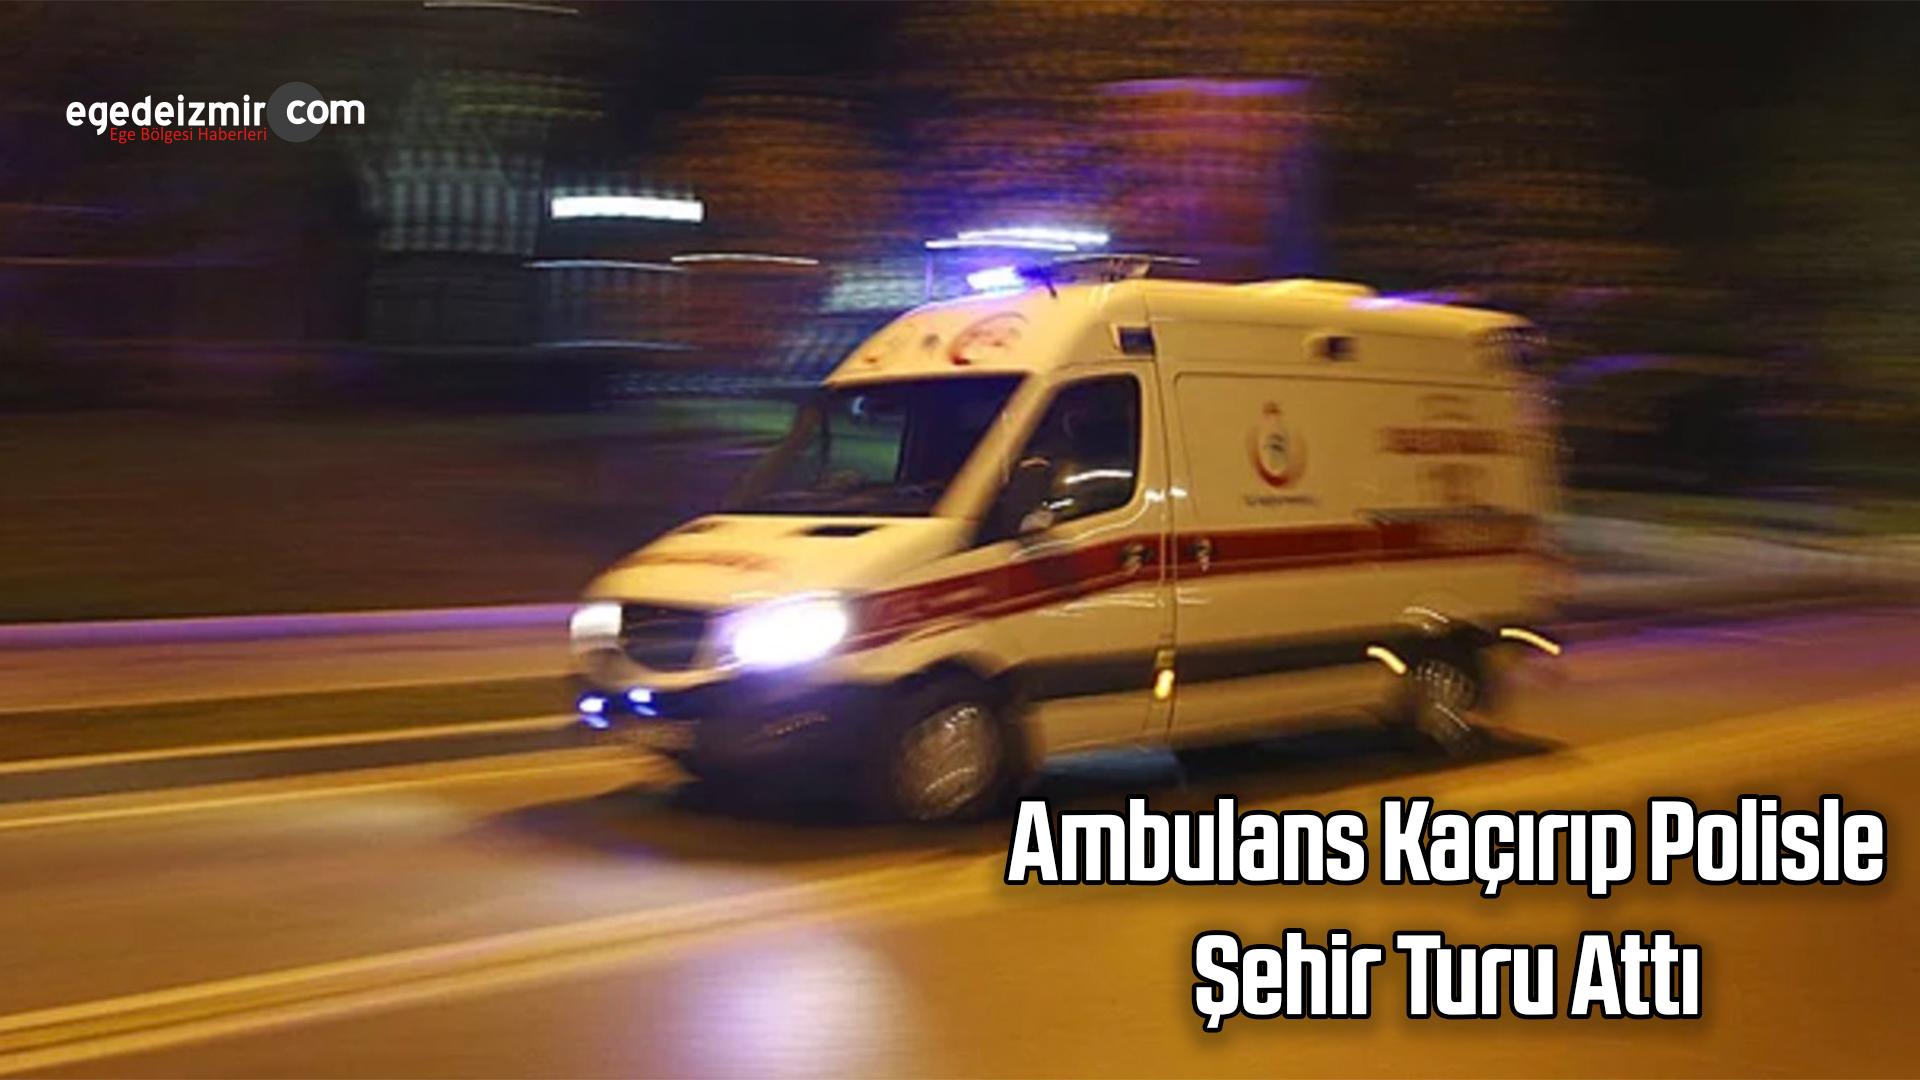 İzmir'de Ambulans Kaçırıp Polisle Şehir Turu Attı